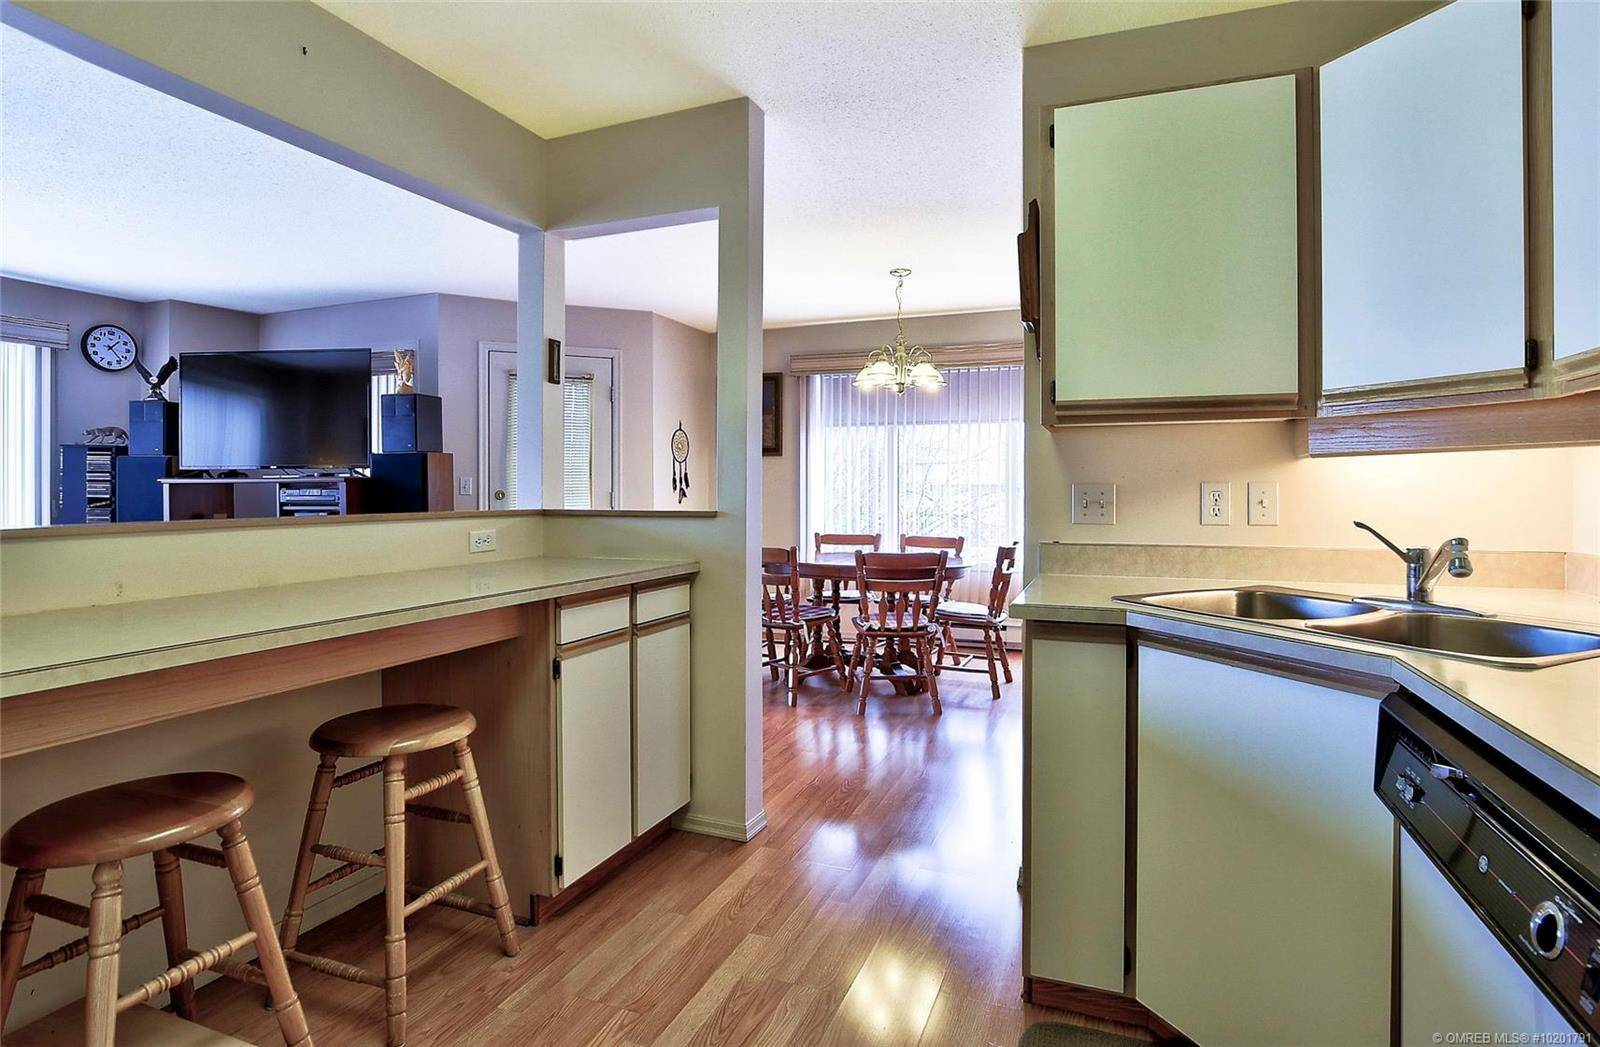 Condo for sale at 180 Hollywood Rd North Unit 212 Kelowna British Columbia - MLS: 10201791